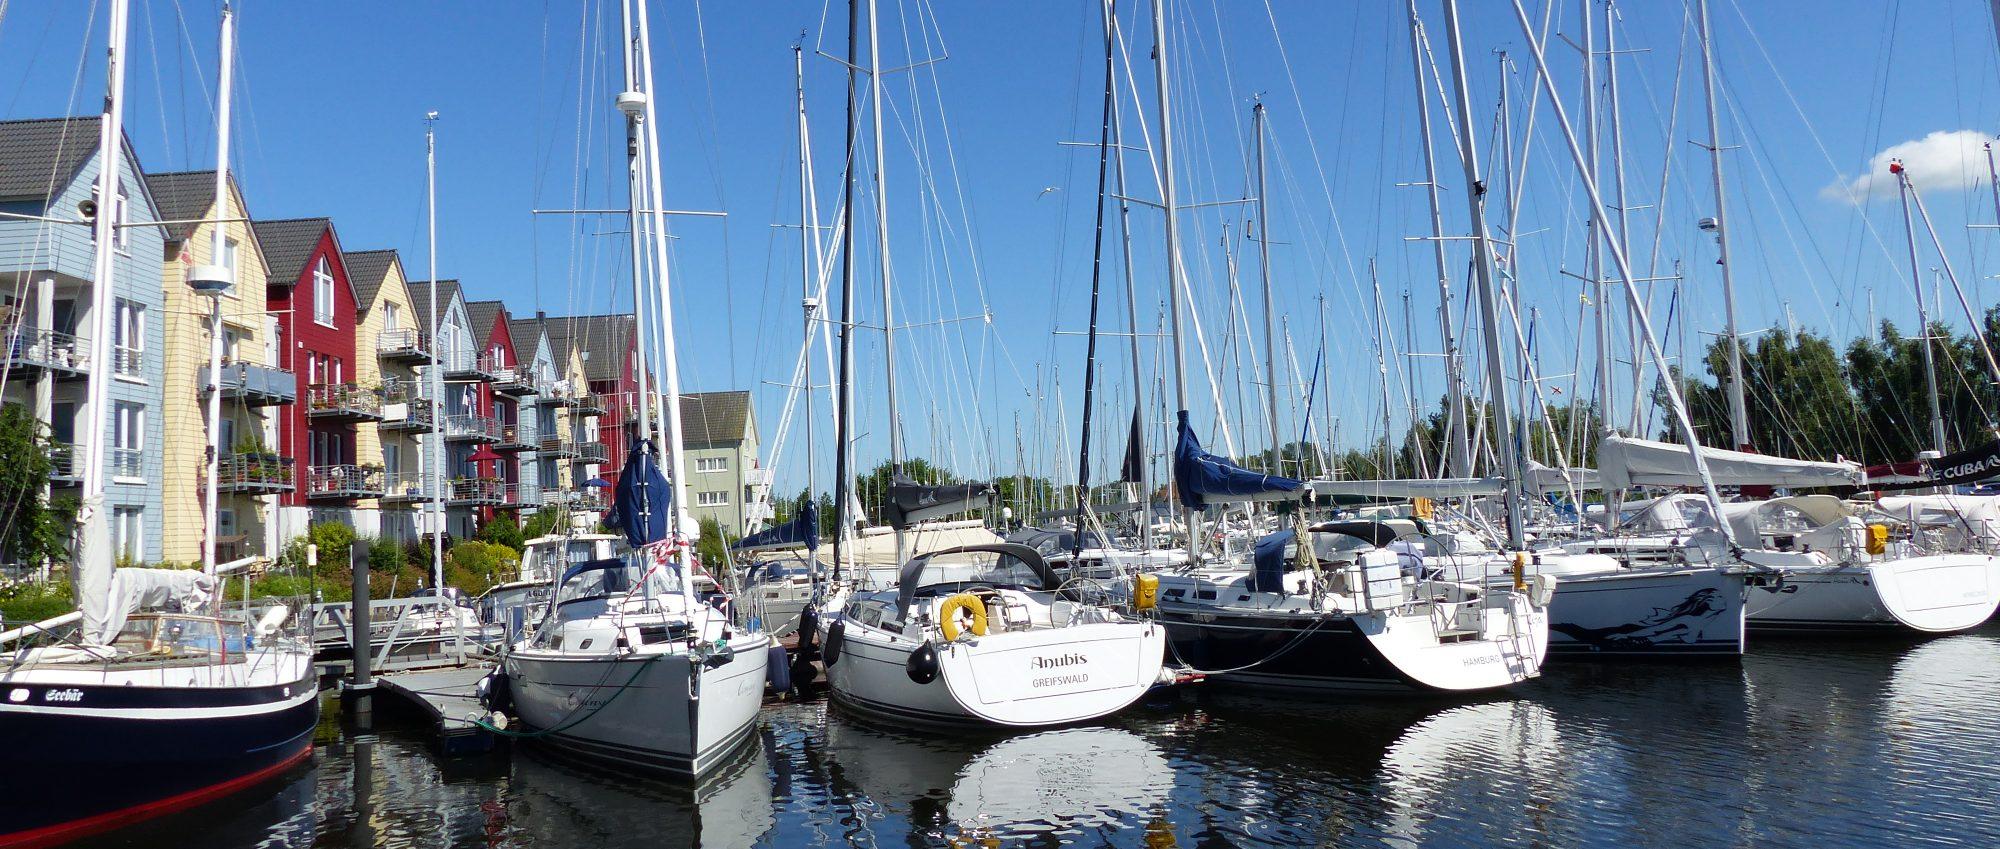 Yachtcharter Greifswald